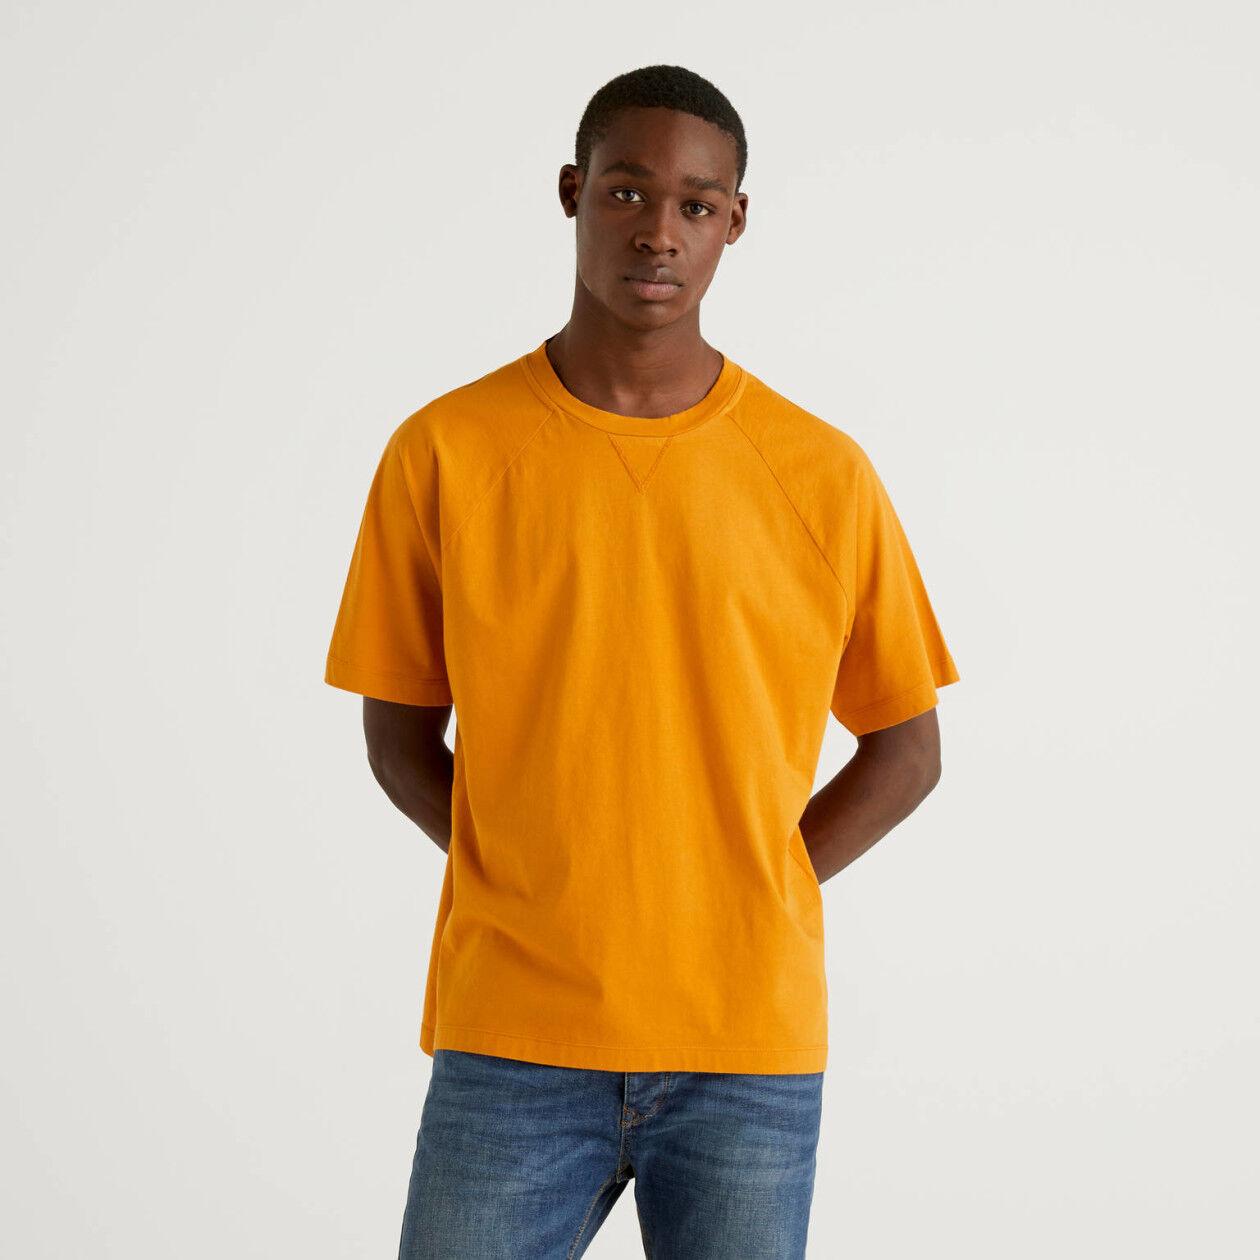 T-shirt 100% βαμβακερό με μανίκια ρεγκλάν